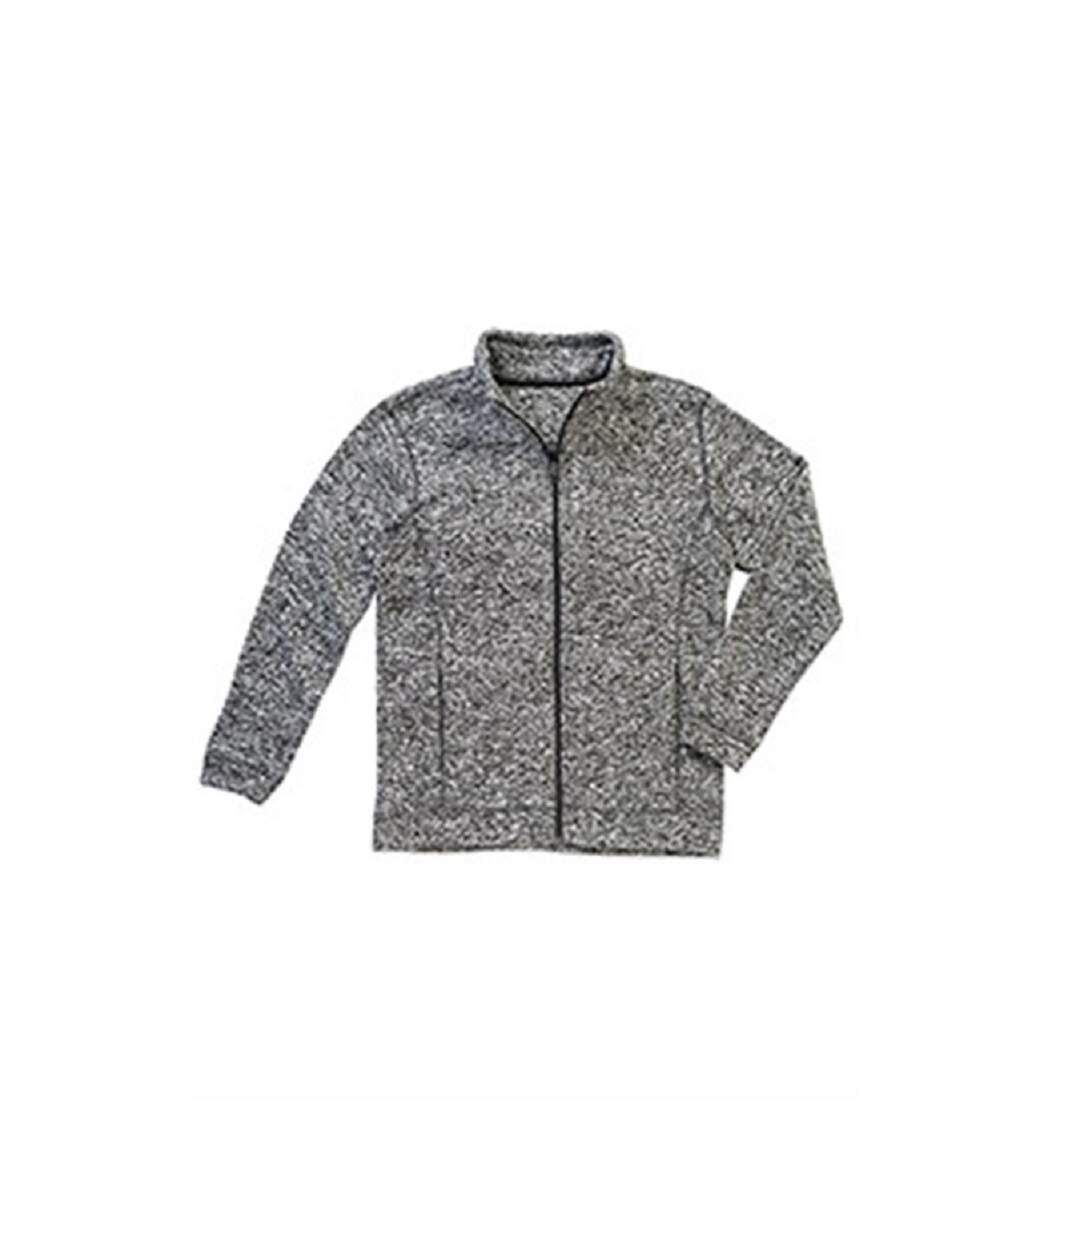 Stedman Mens Active Knitted Fleece (Dk Grey Melange) - UTAB328